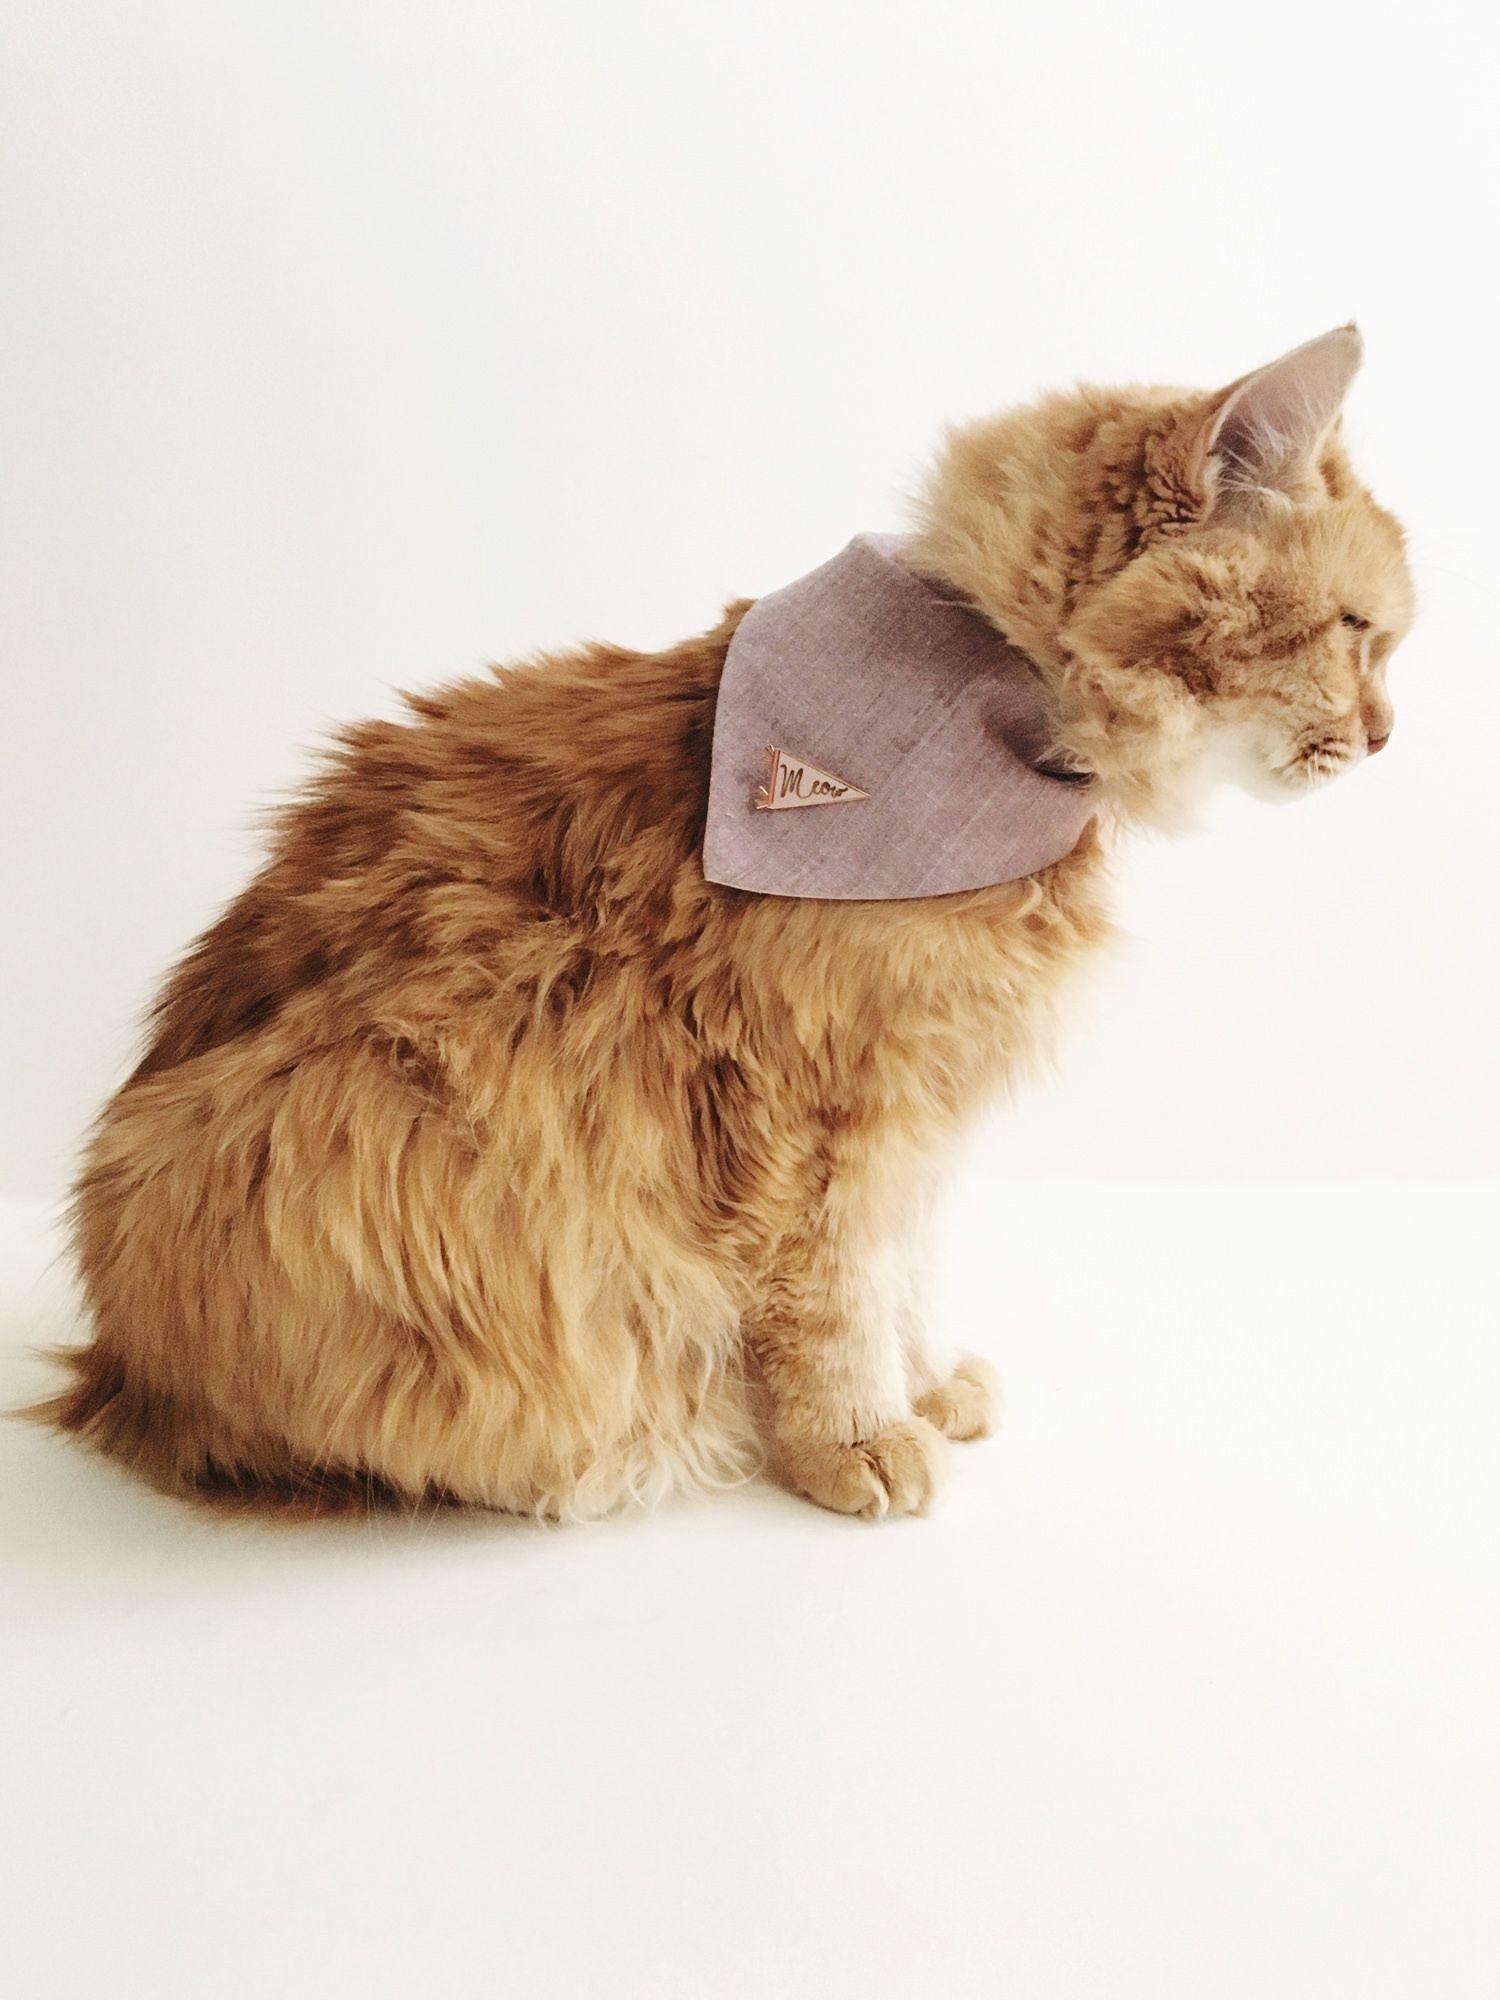 Diy Bandana For Your Cat Siamese Social Club Cats Cat Collars How To Tie Bandana